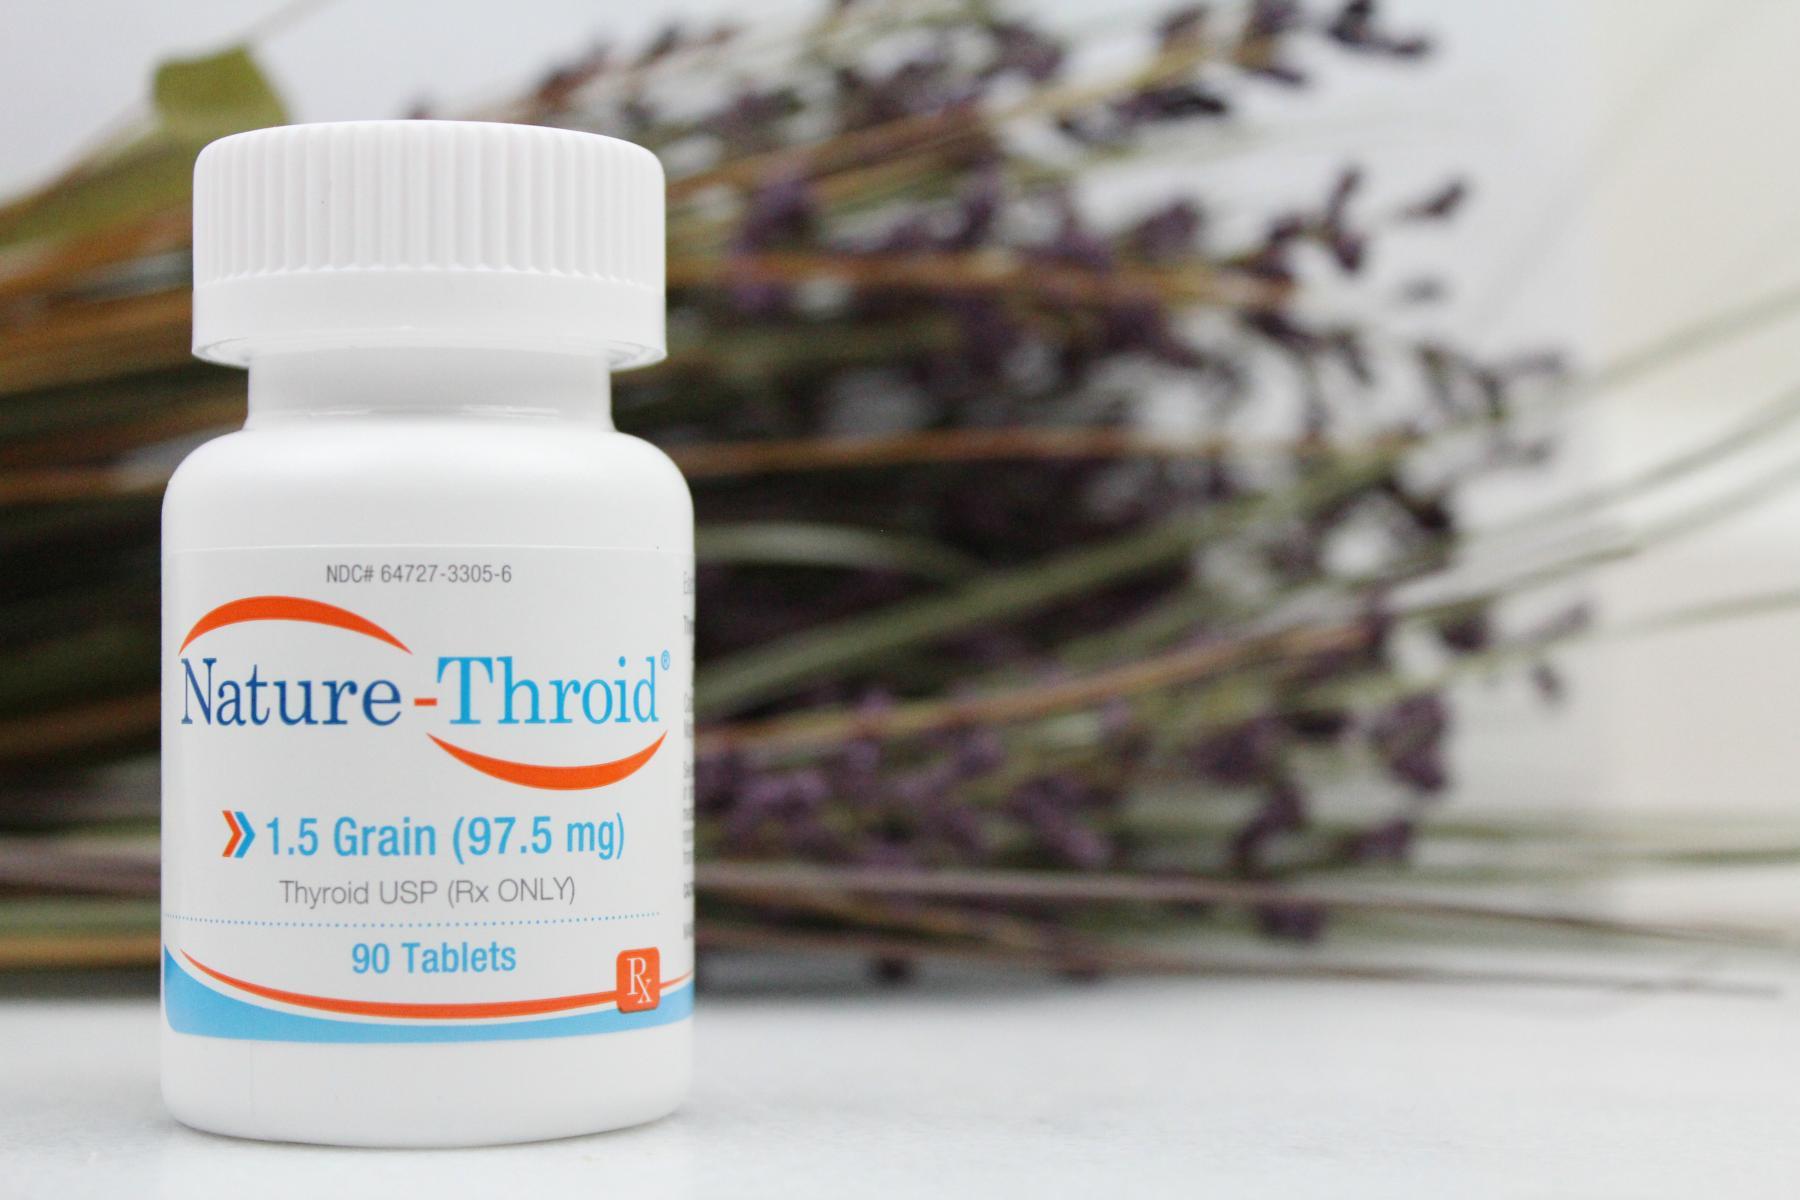 throid nature natural hypothyroidism